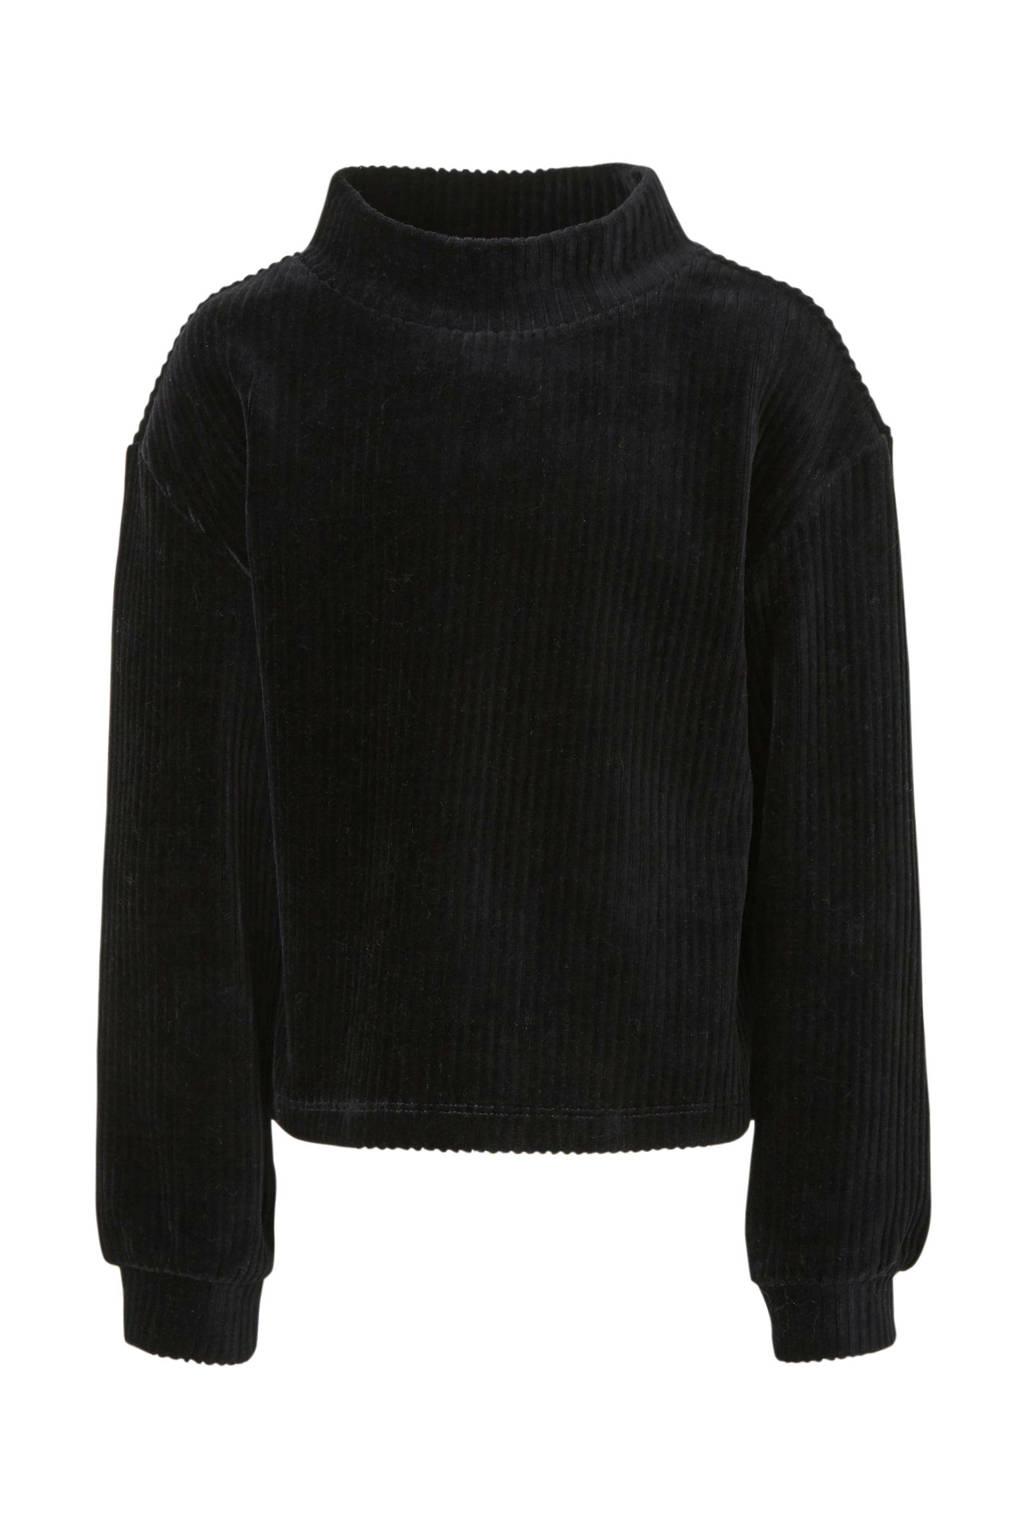 C&A Here & There ribgebreide fluwelen top zwart, Zwart